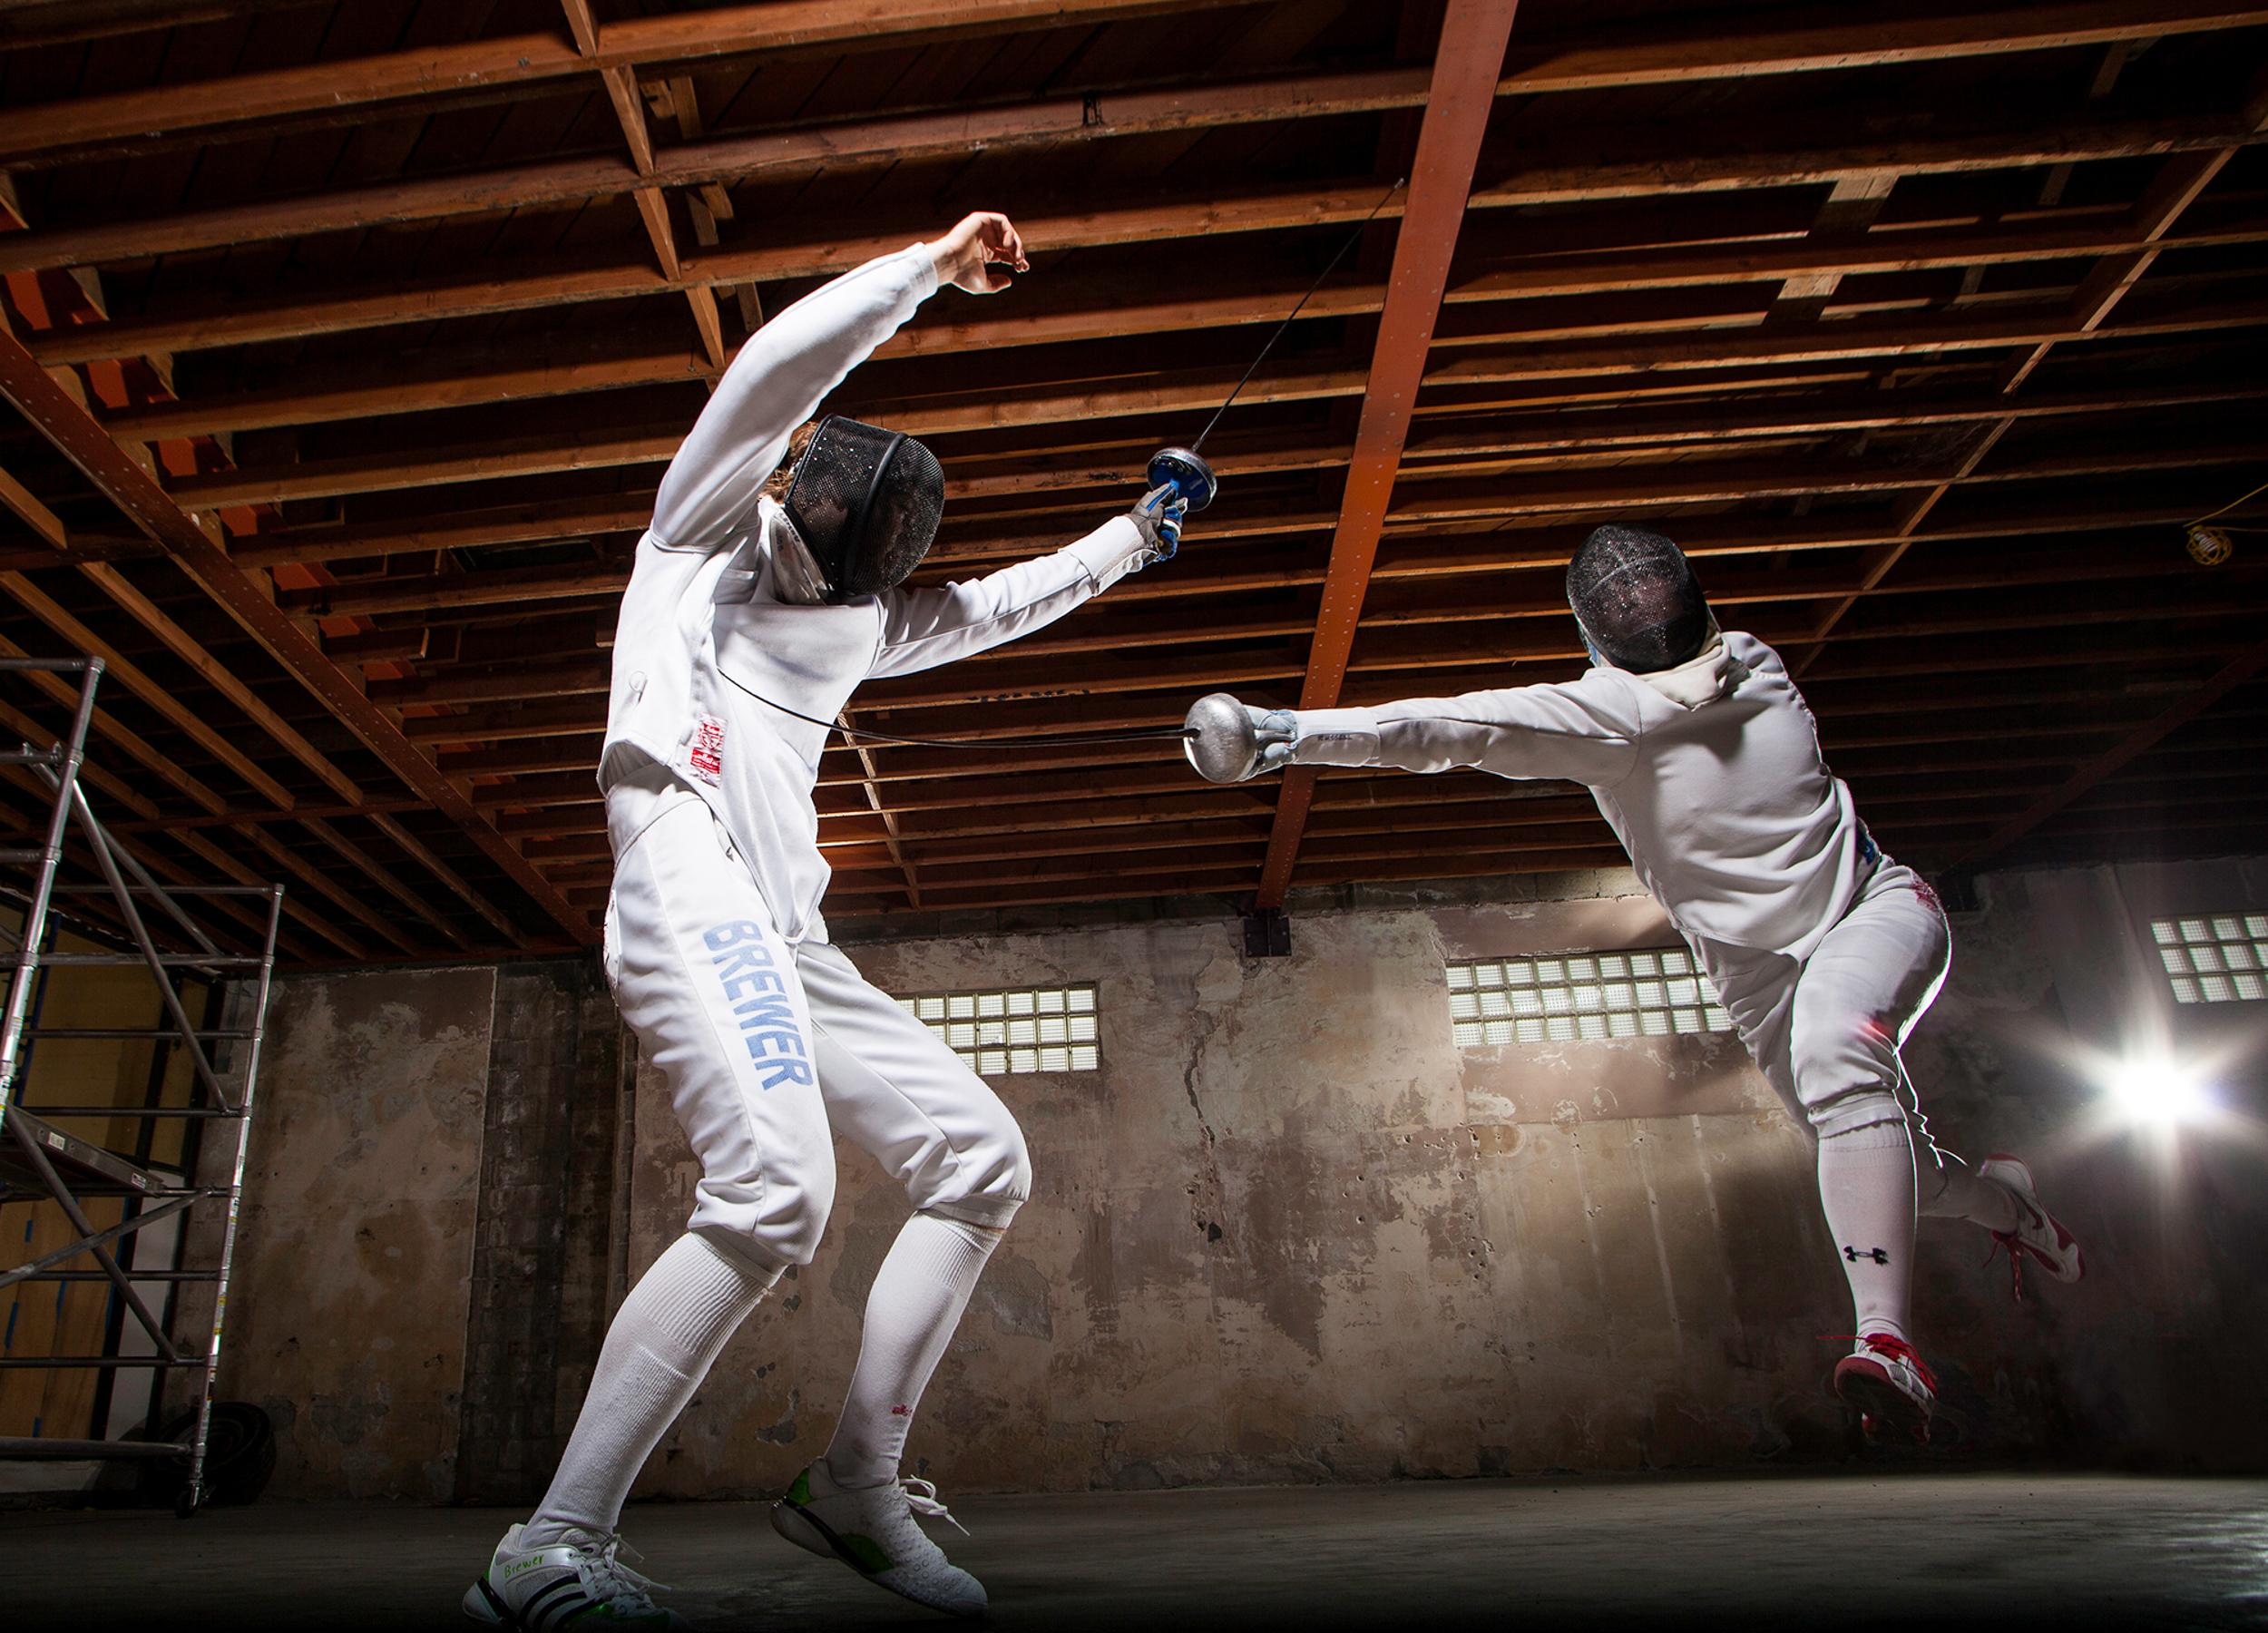 fencing_28.jpg